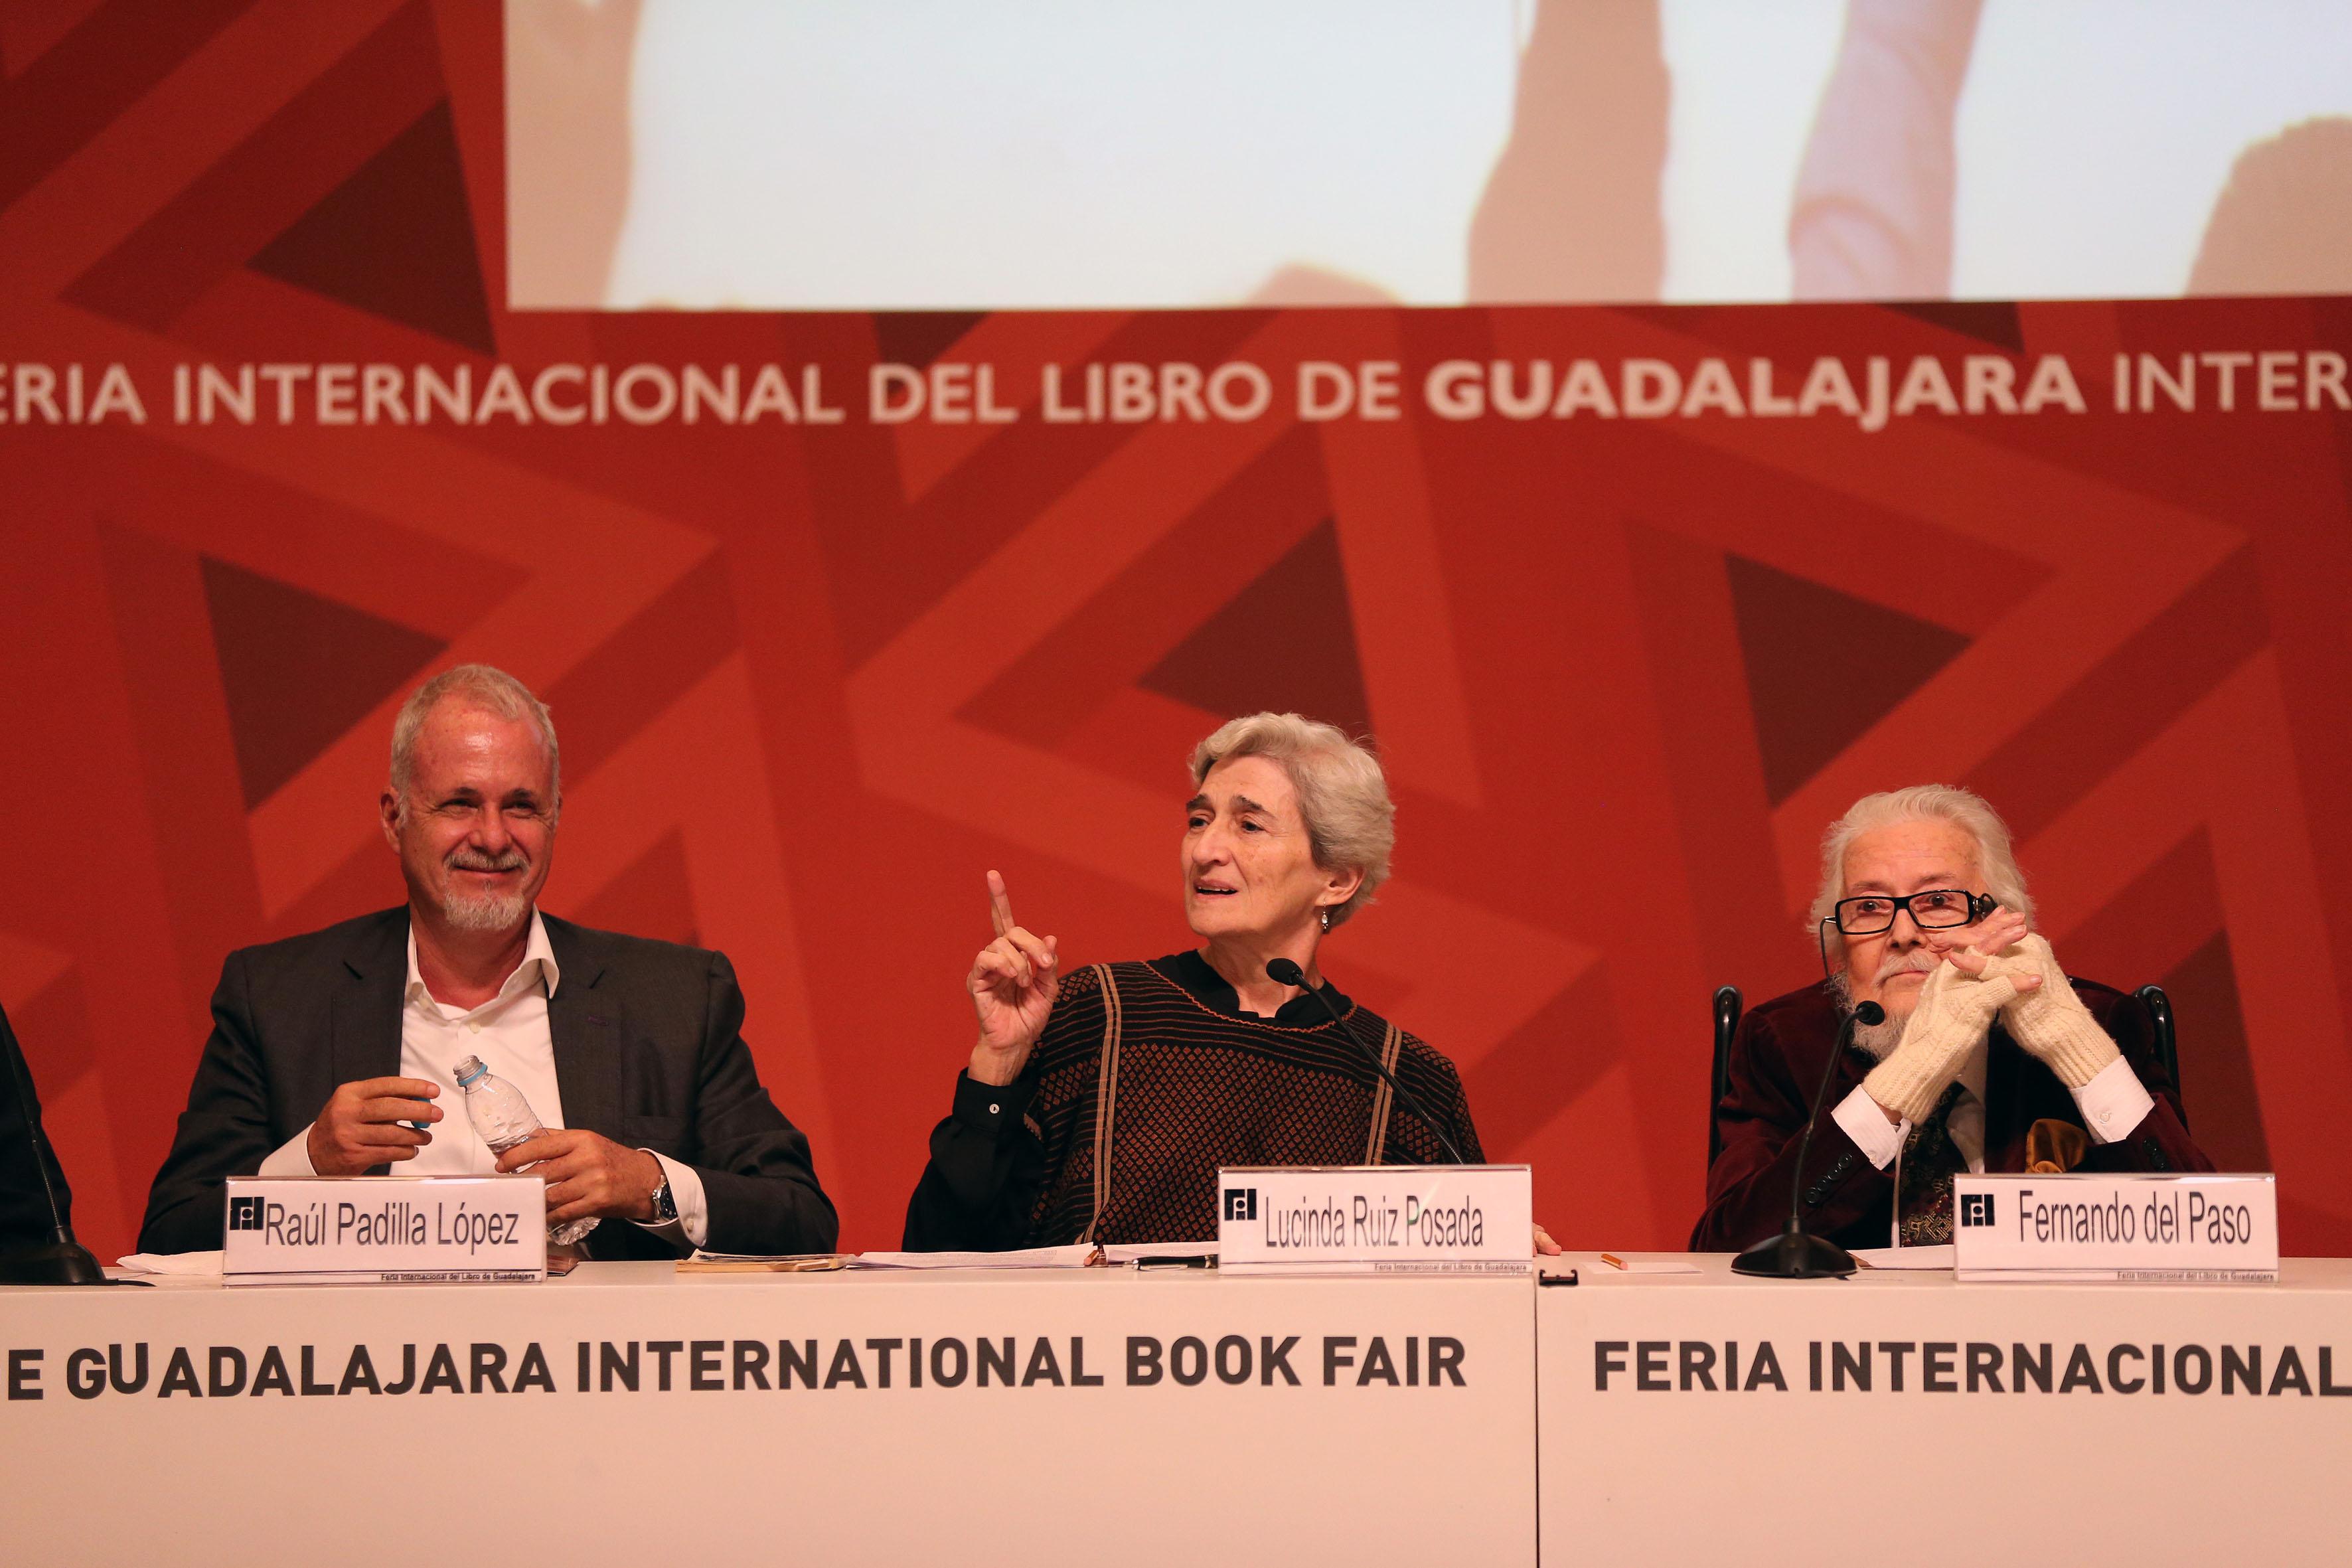 Lucinda Ruiz Posada, viuda de Gutiérrez Vega, Fernando del Paso y Raúl Padilla López